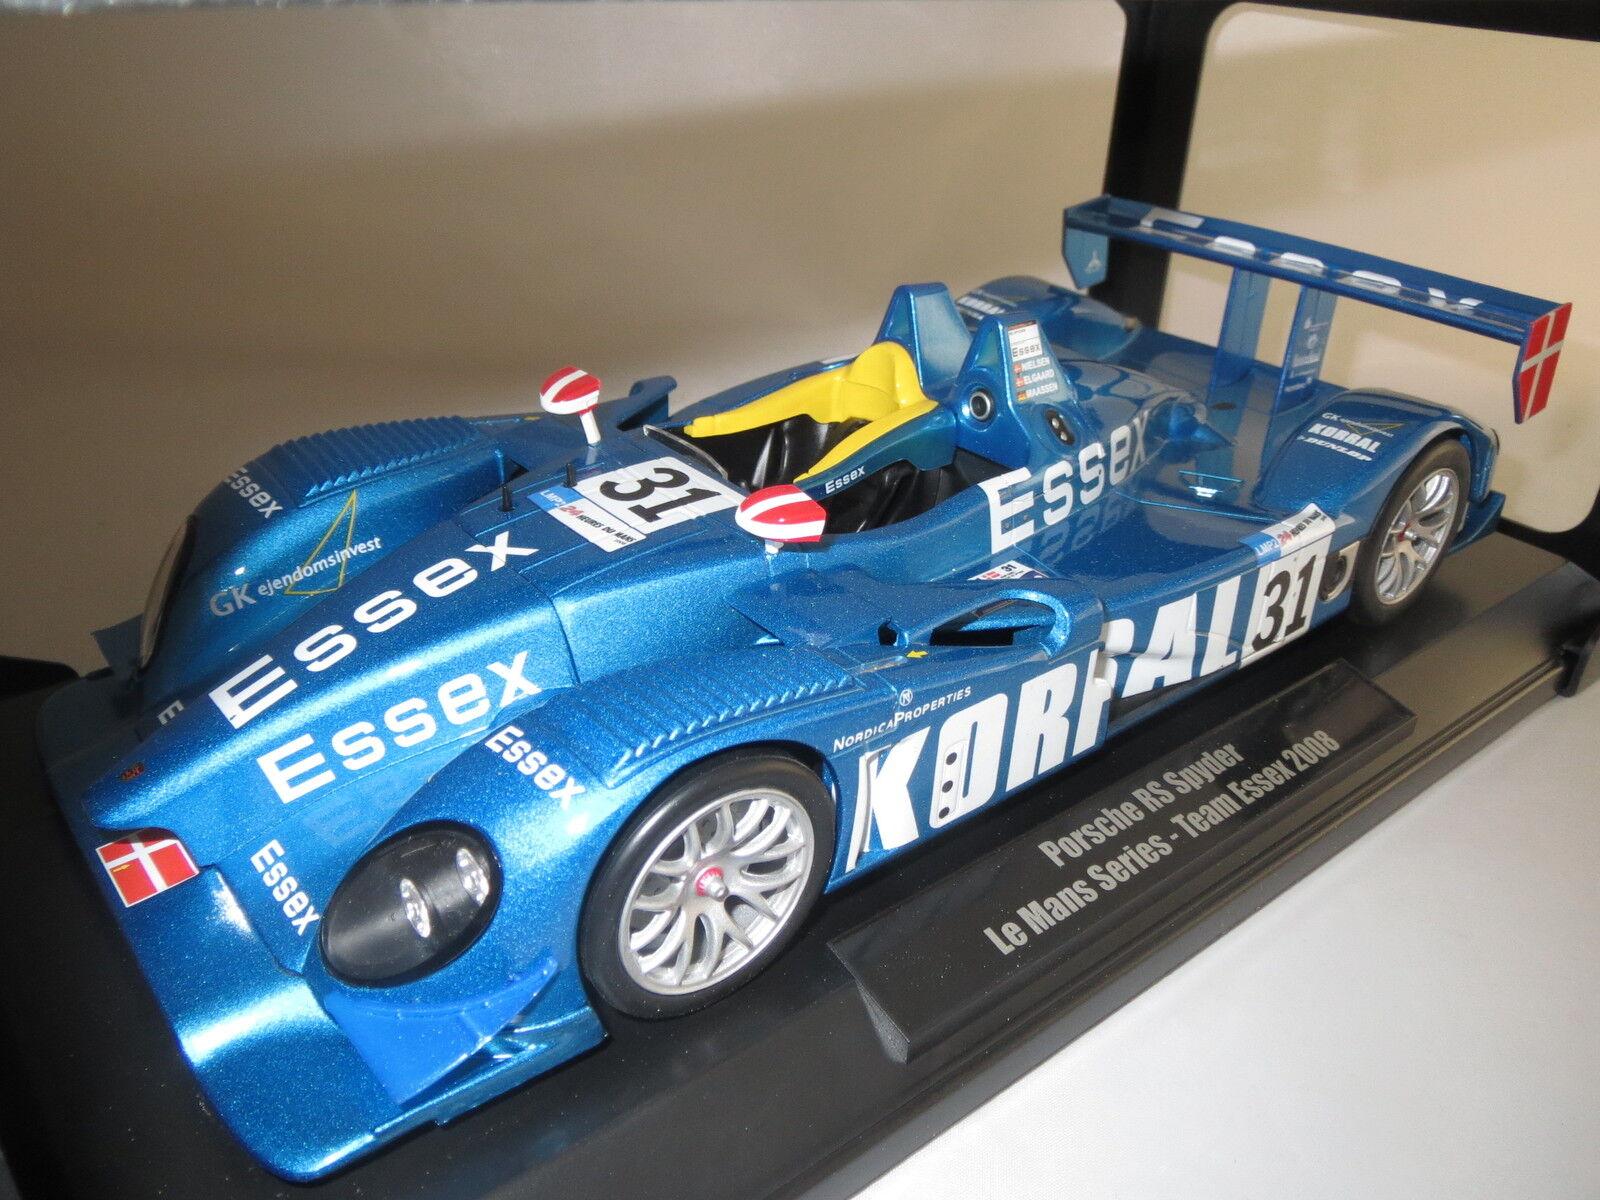 NOREV porsche rs spyder lmp2-24 Leber tu Mans team Essex  2008  1 18 OVP